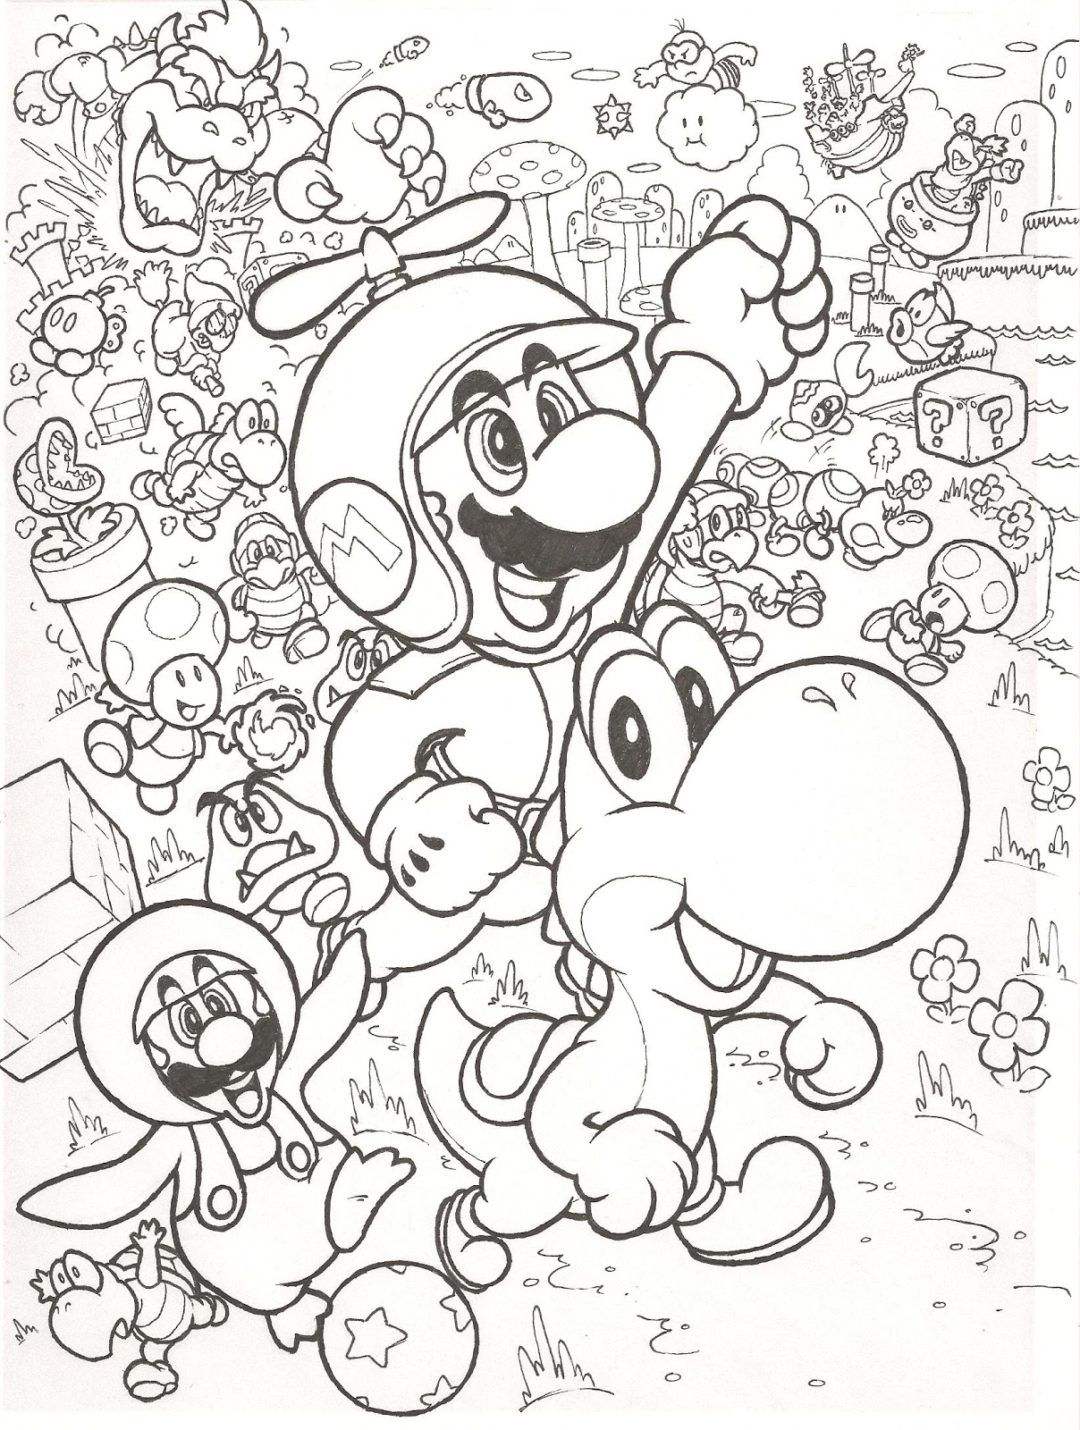 Coloring Rocks Super Mario Coloring Pages Mario Coloring Pages Pokemon Coloring Pages